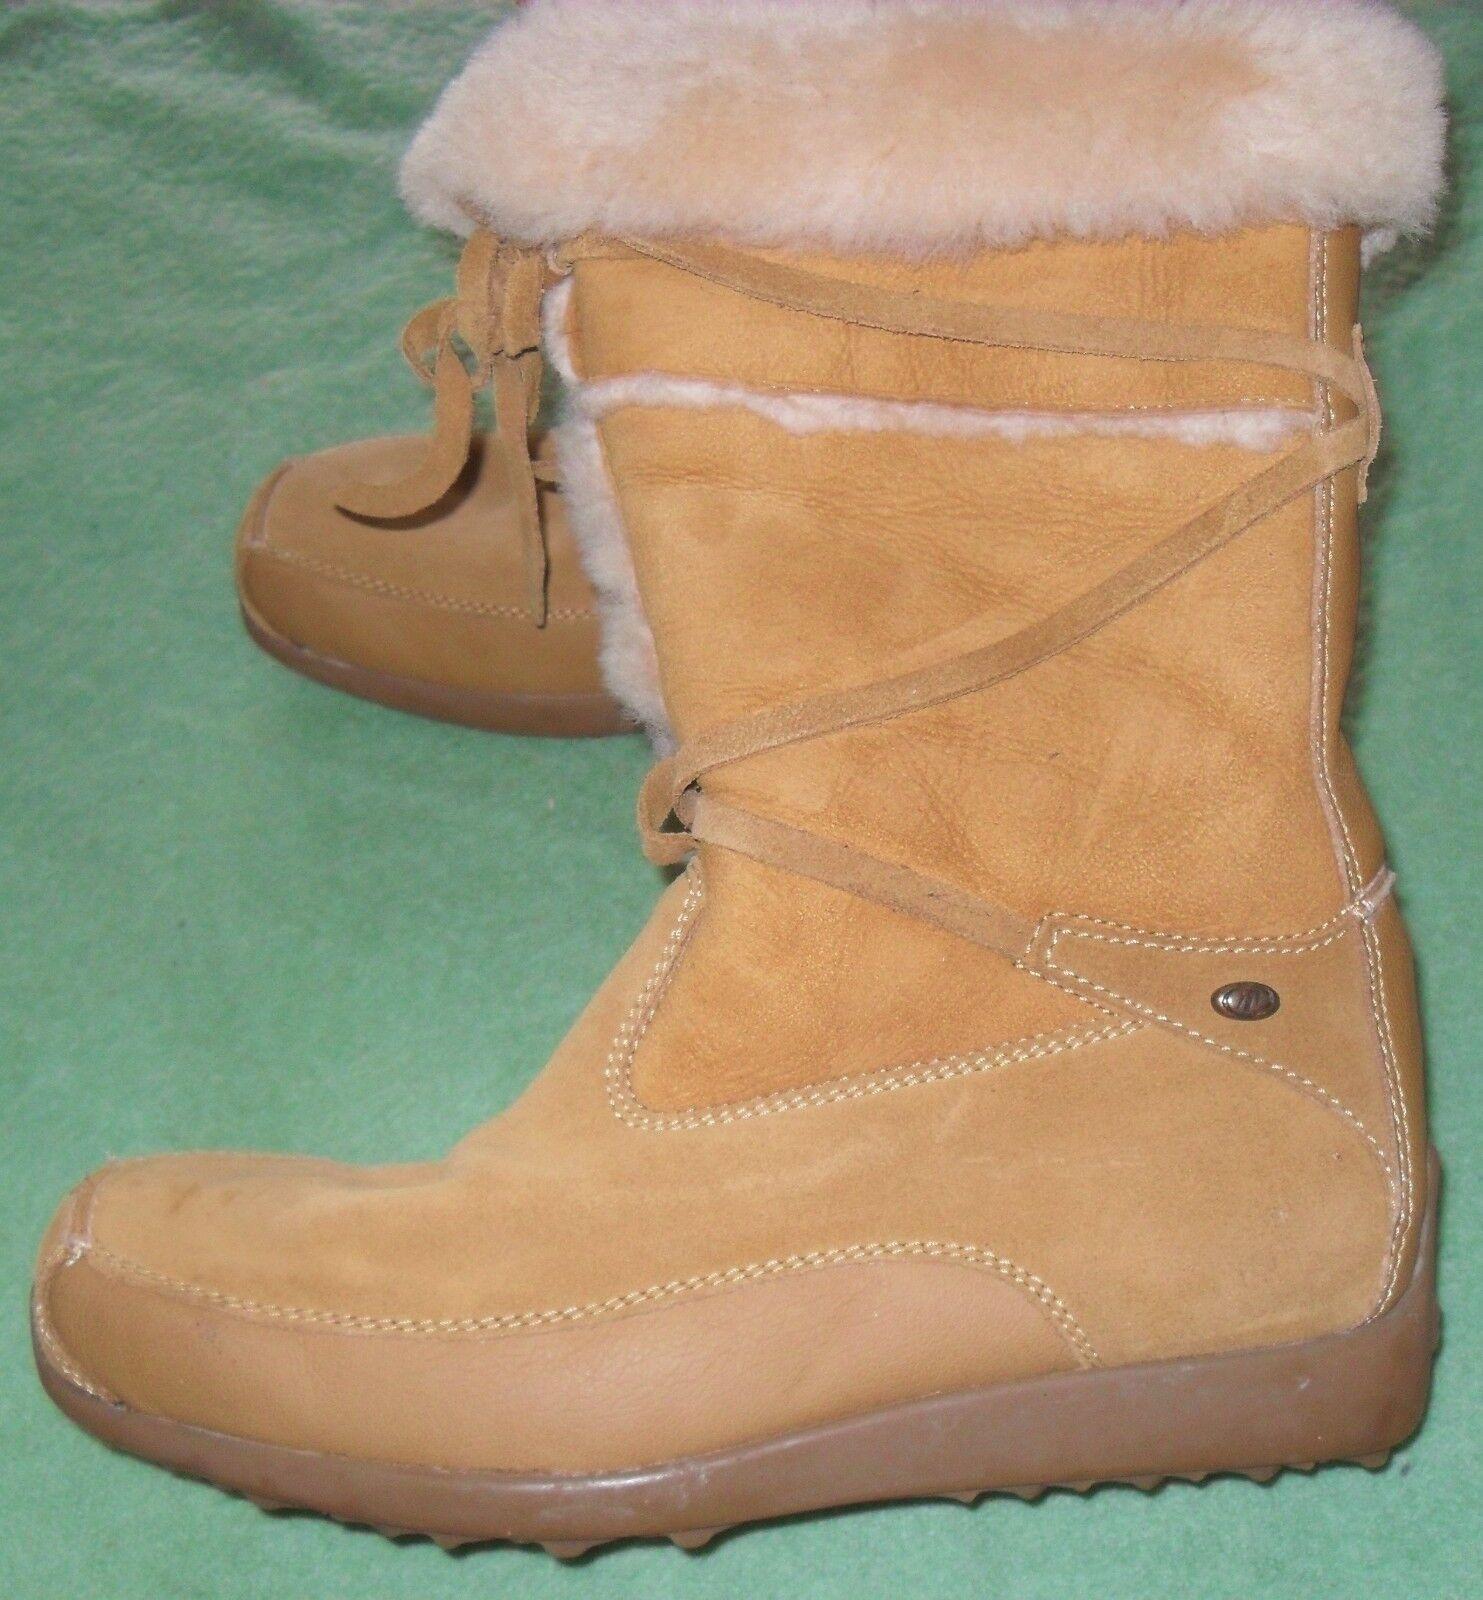 Tecnica.Stiefel,Marken Schuhe.Gr. 40  2/3 ,UK 7